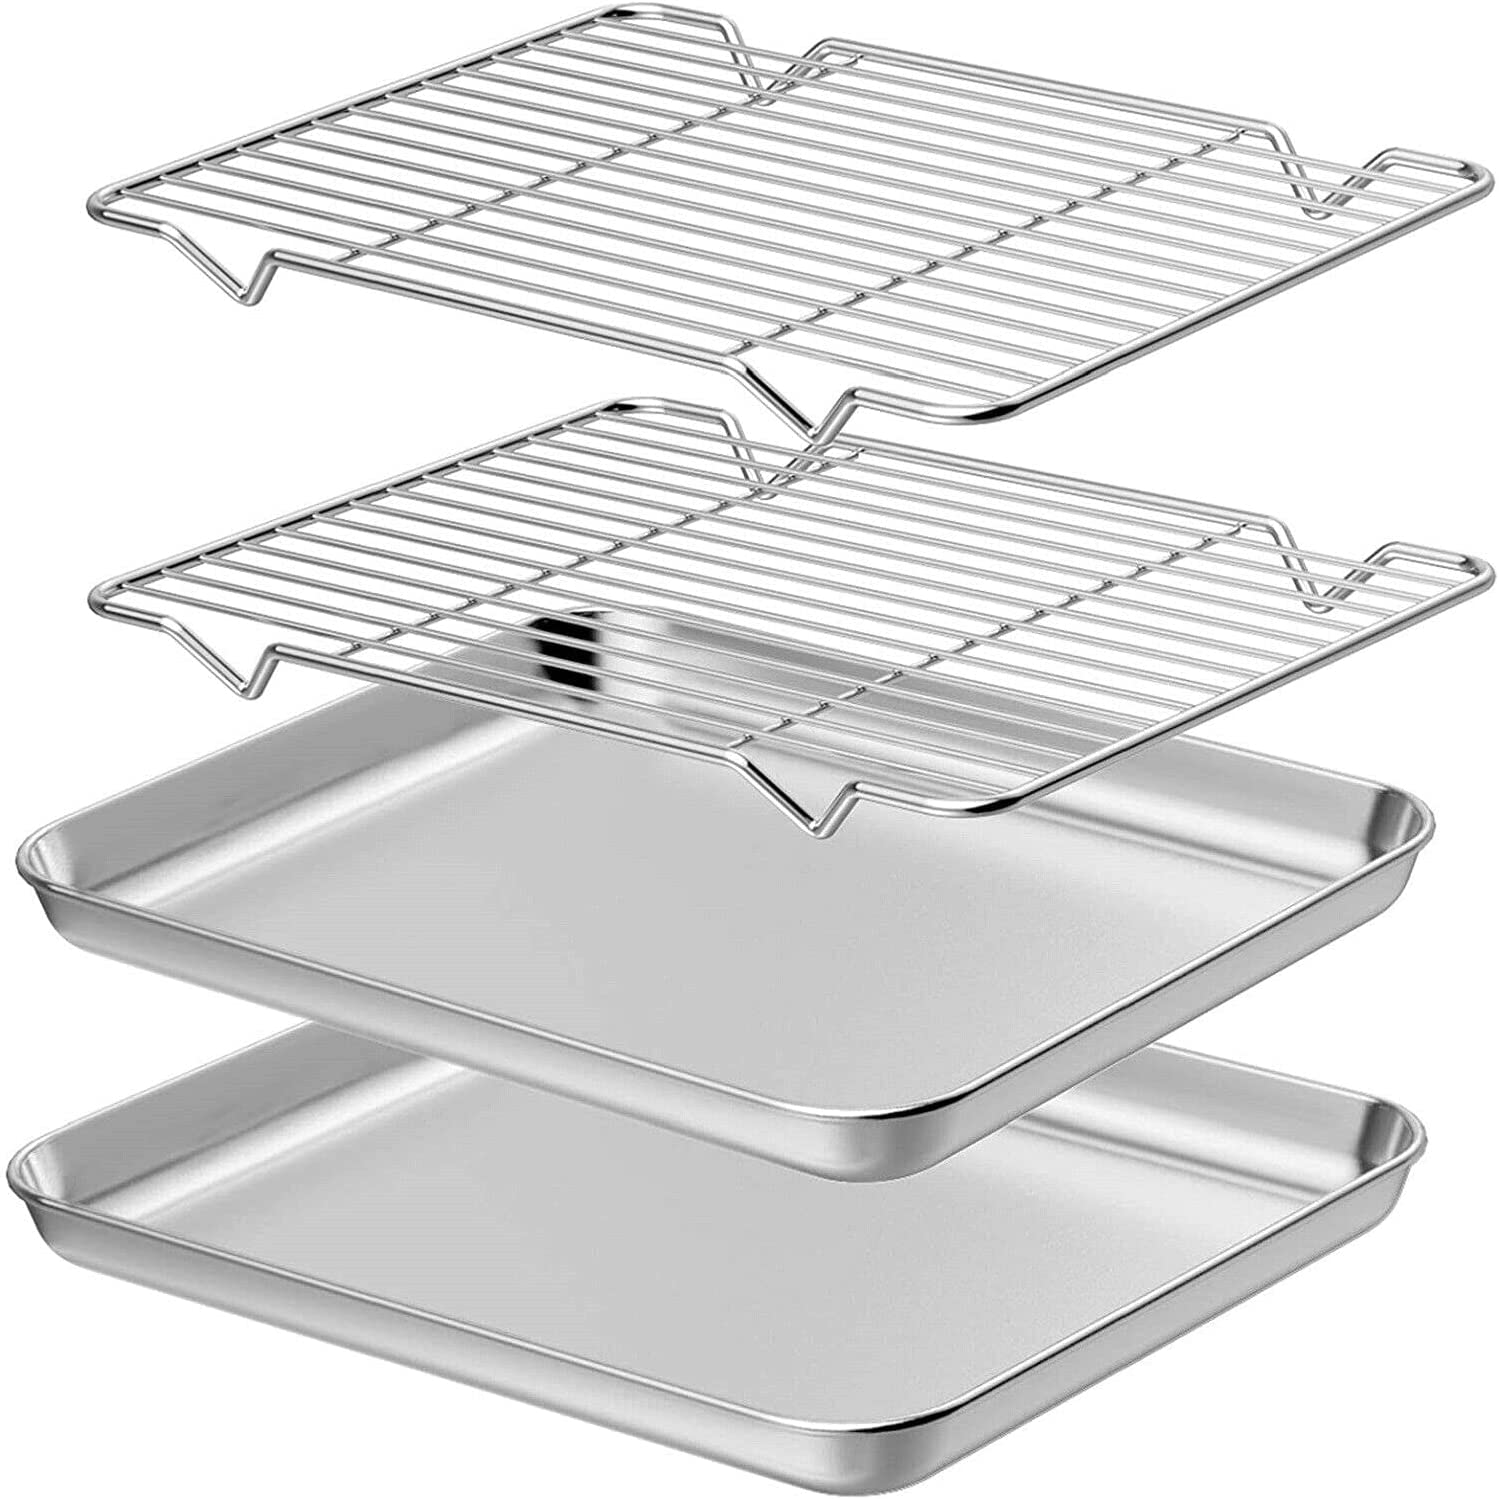 1 Set of Baking Sheet Rack Cookie Pan Long Beach Mall Shee Stainless Price reduction 2 Steel